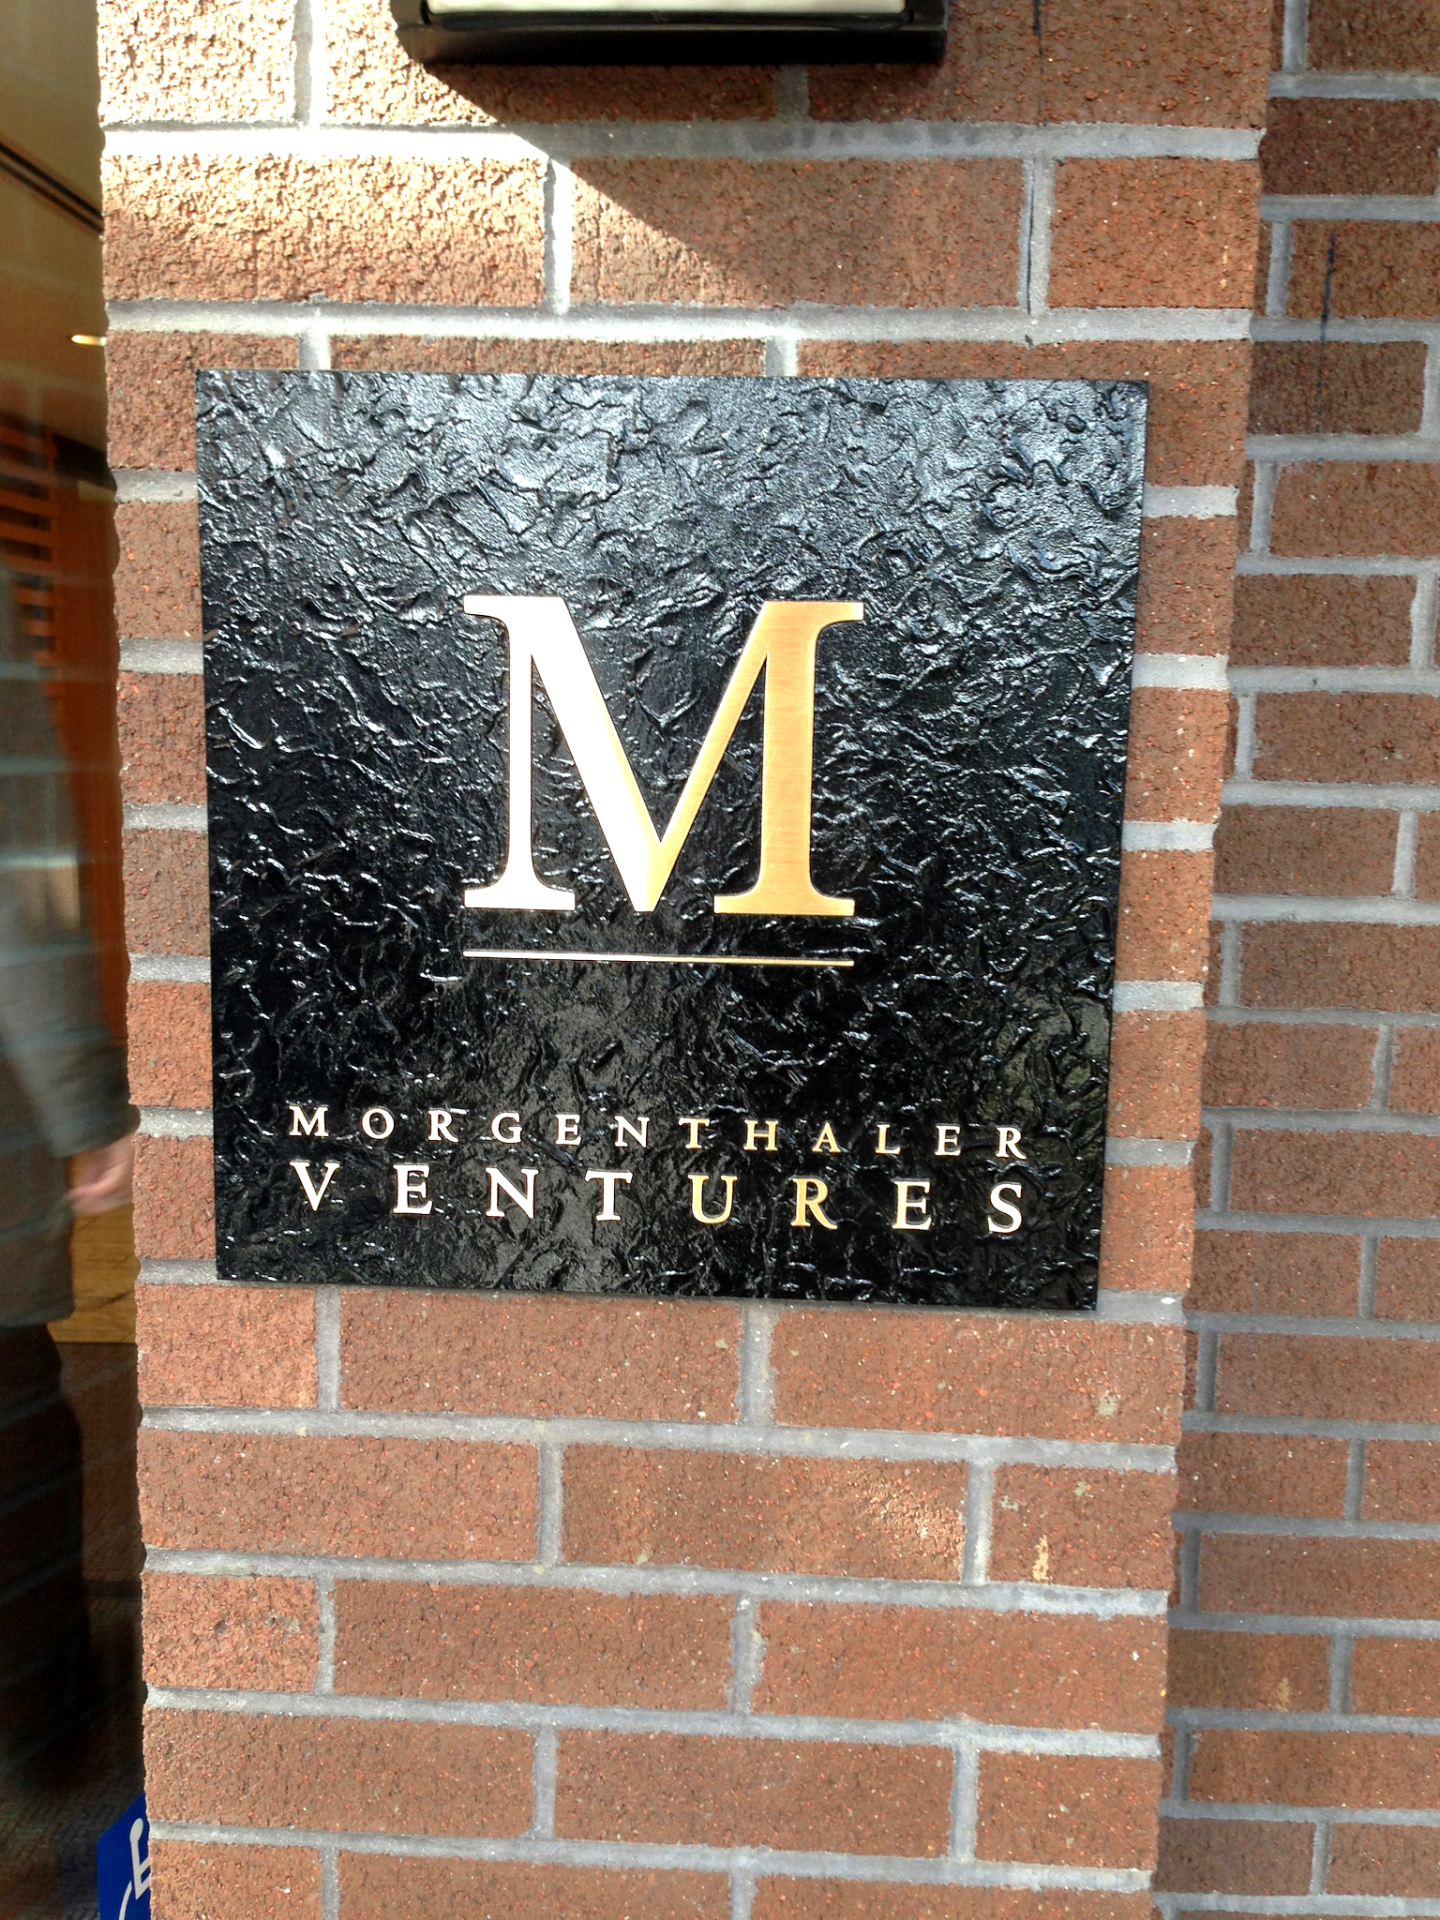 Morgan Thaler Ventures